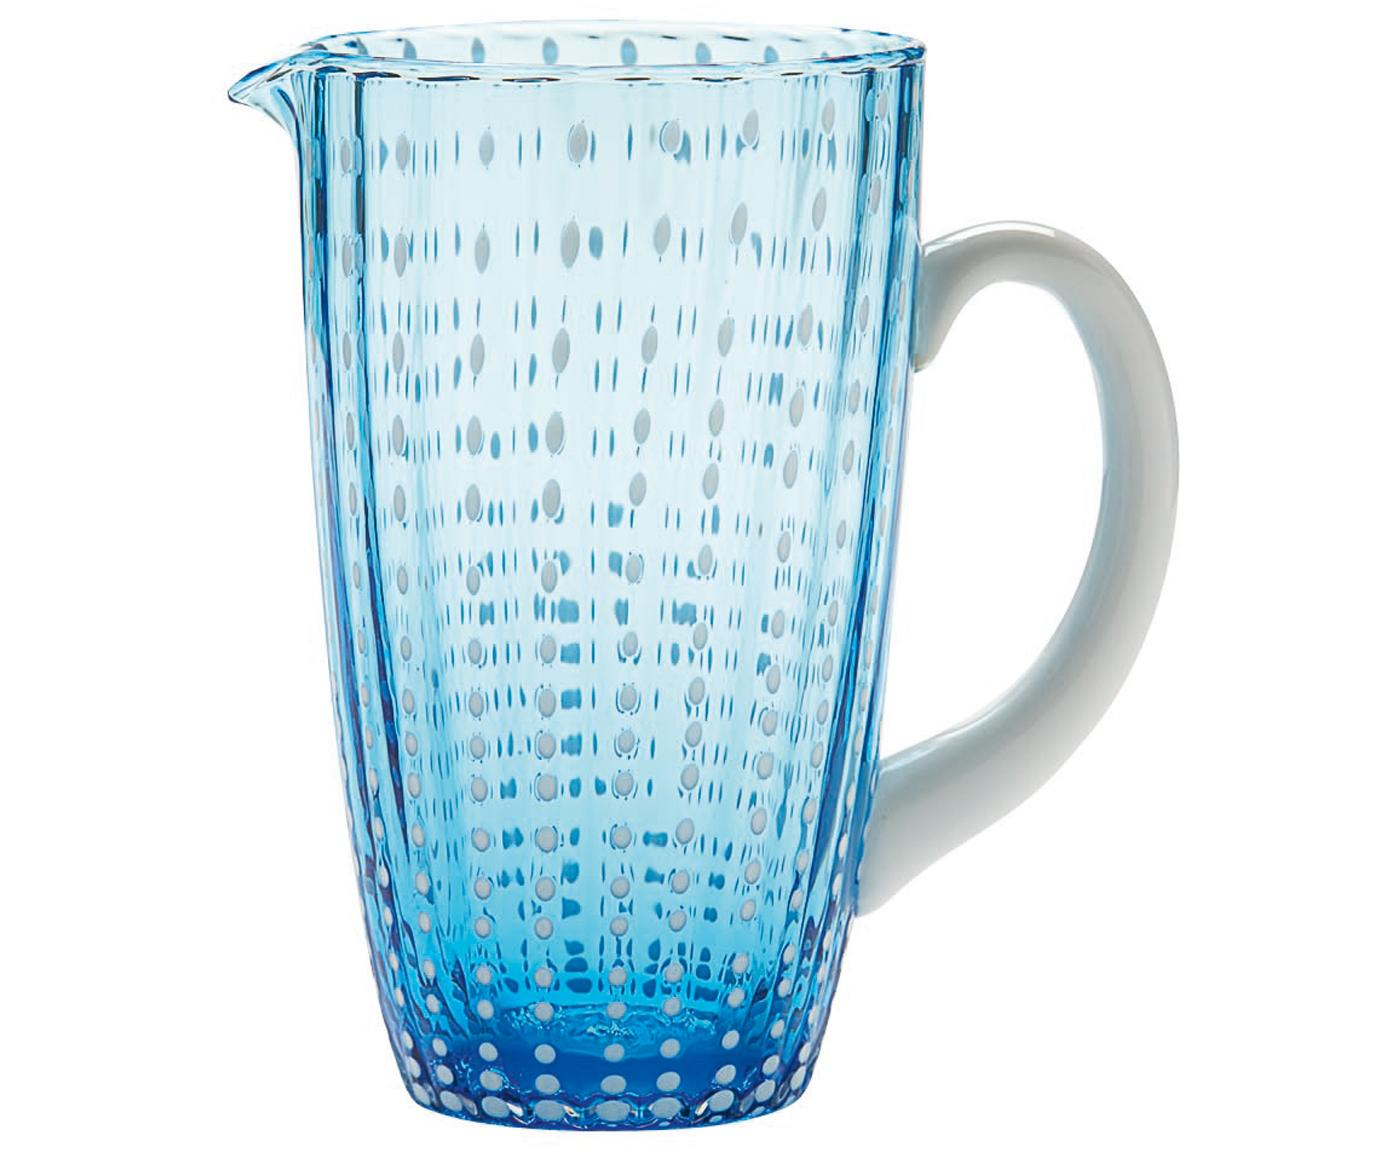 Mondgeblazen karaf Perle, Glas, Waterkleurig, wit, transparant, 1.6 L